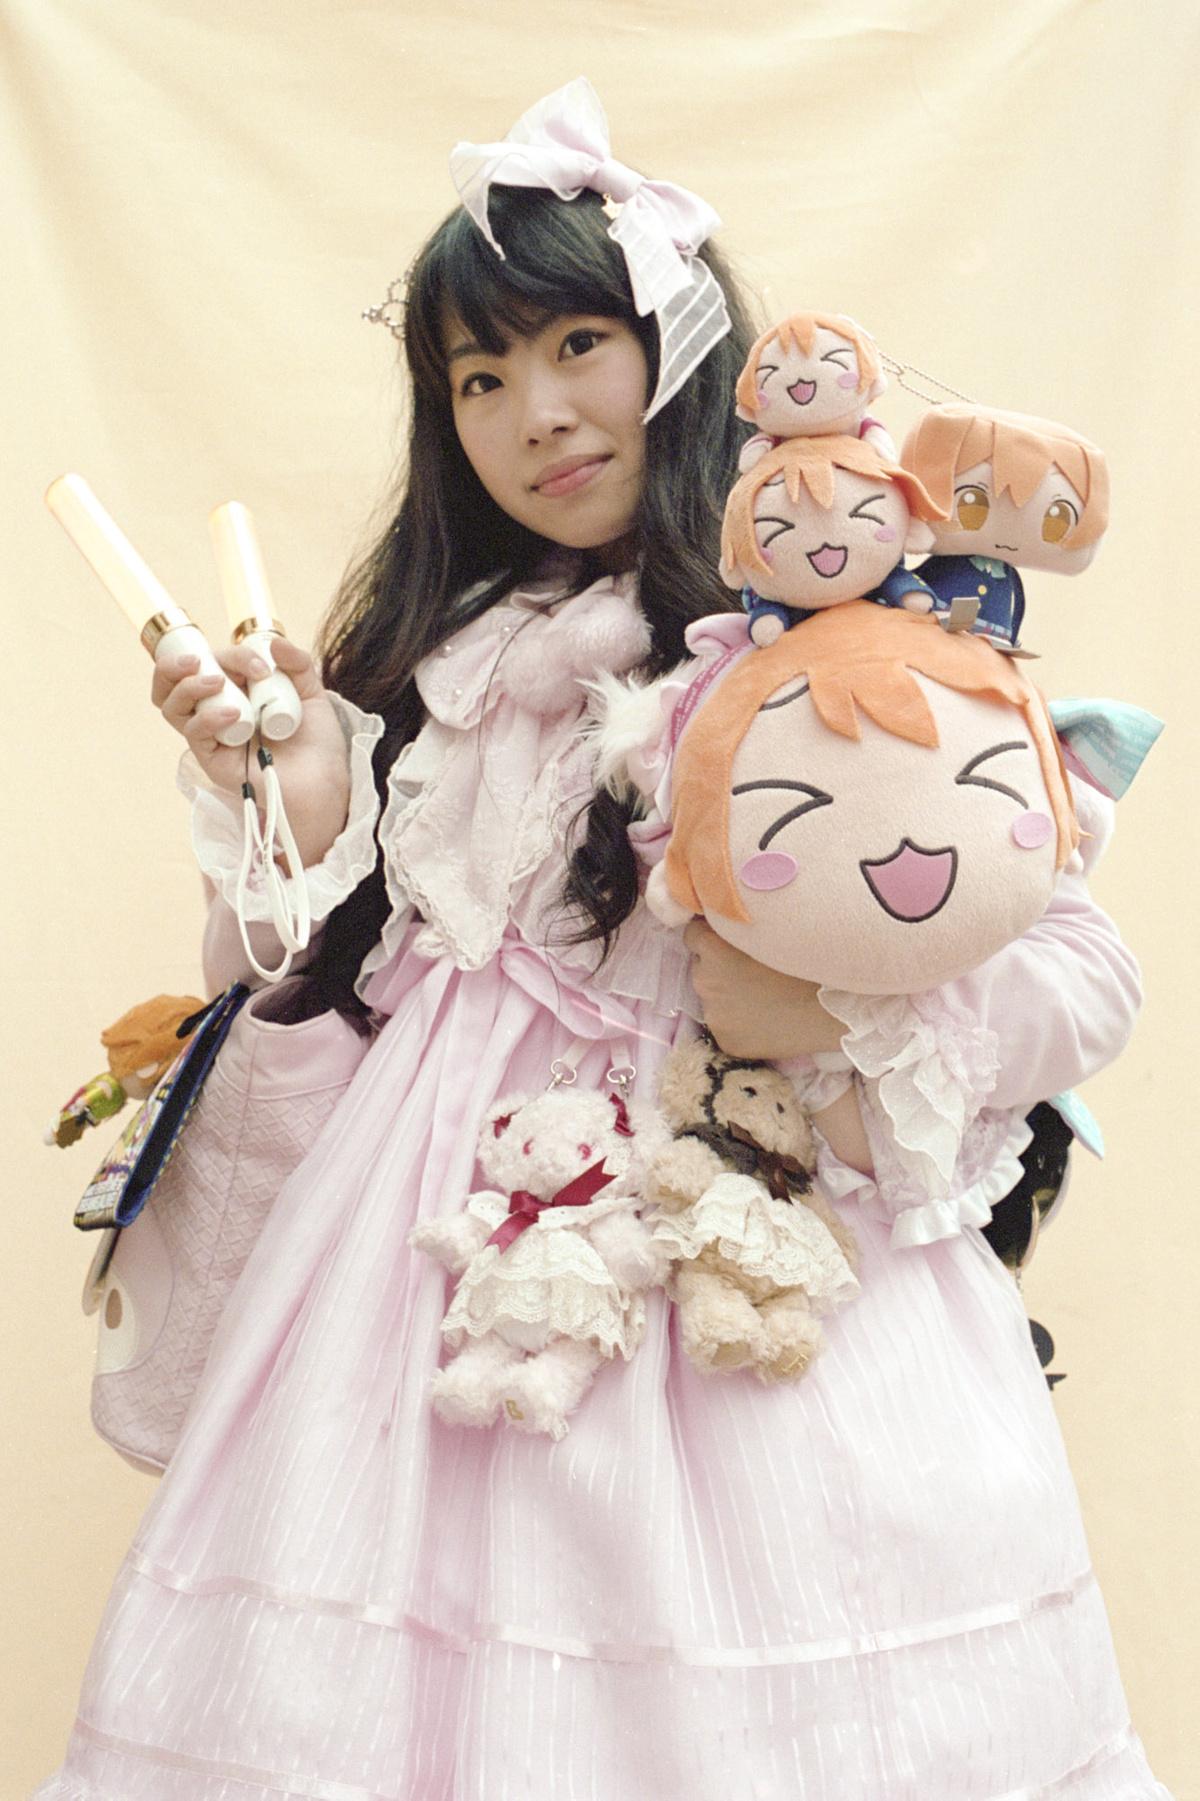 Japan teen idol fetish 1